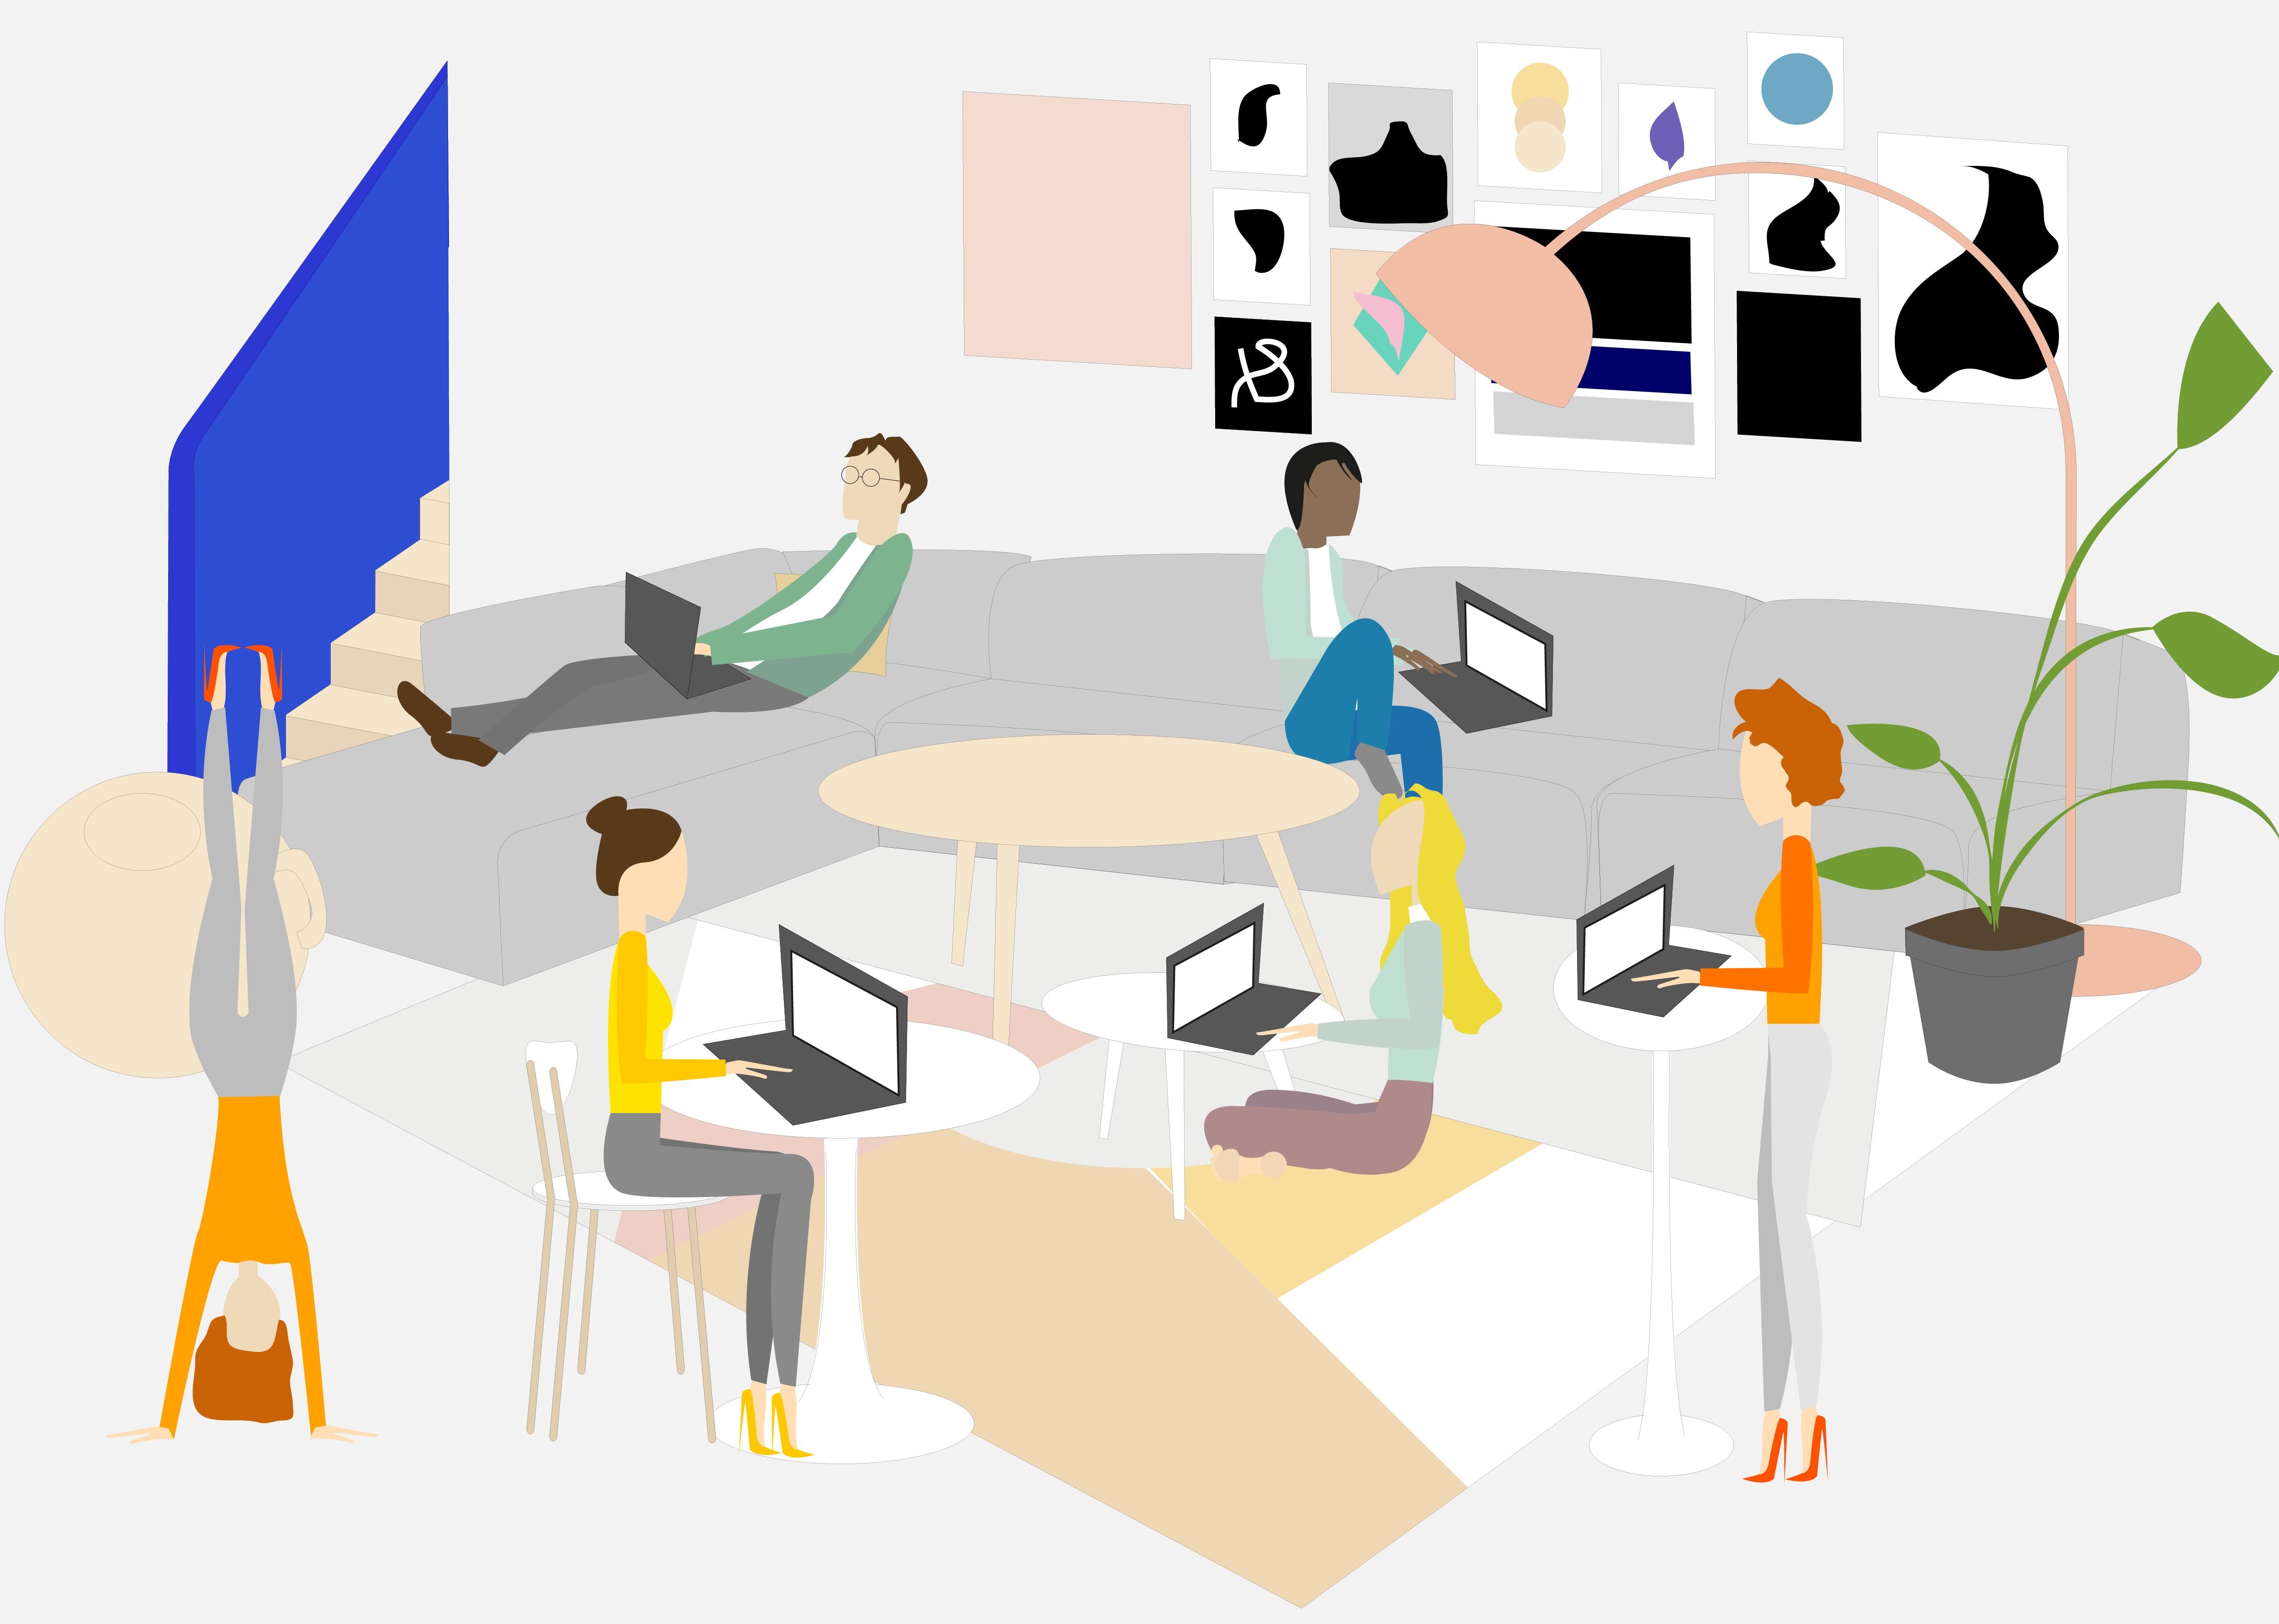 travailler sans avoir mal au dos kamasutra jobasutra workasutra illustration par charlie la freelance